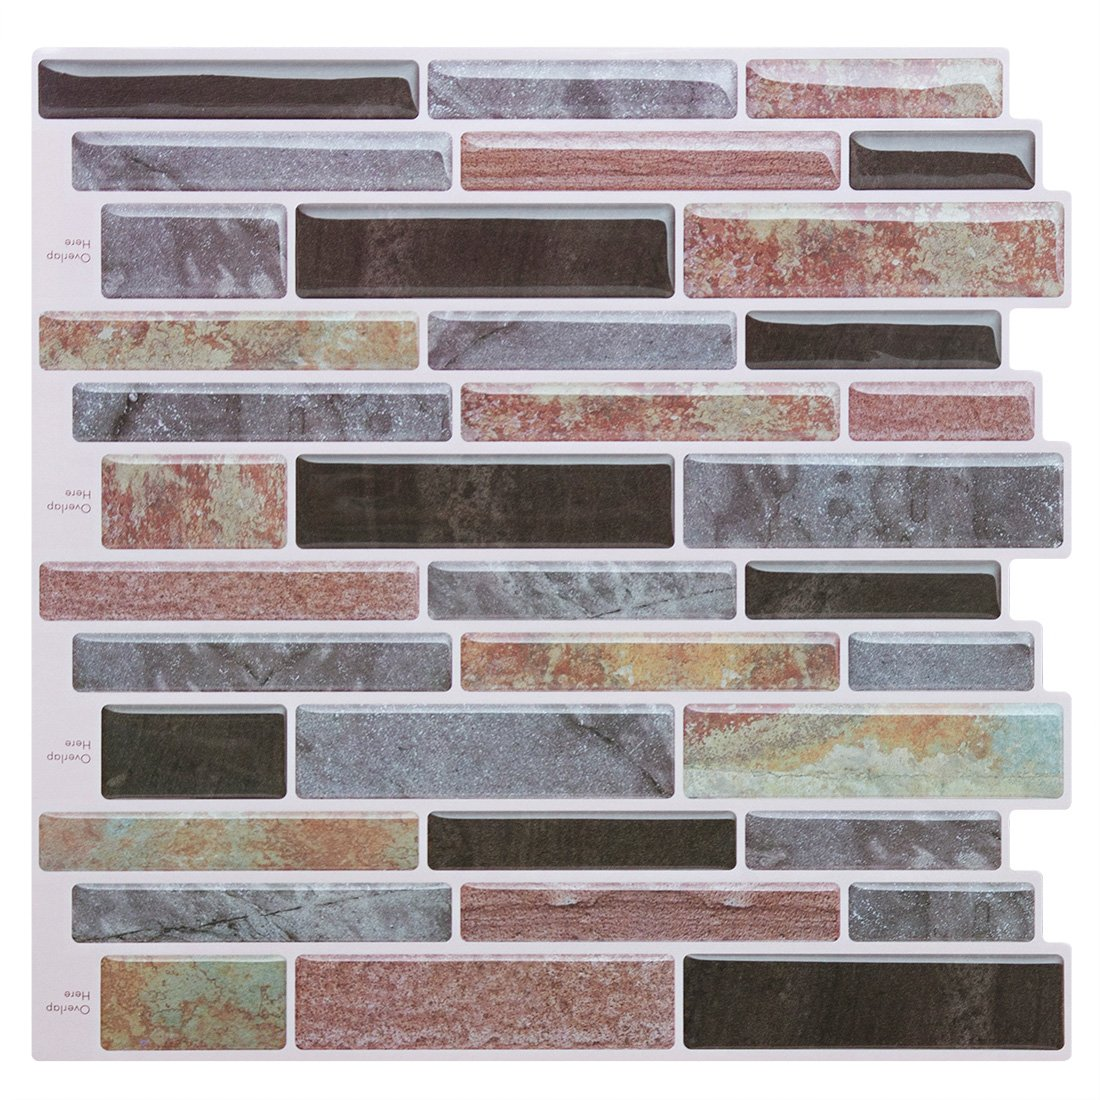 Peel and Stick Tile Backsplash-Mist Purple Backsplash Peel and Stick for Kitchen Bathroom,Stick on Tiles for Backsplash(4 Tiles)